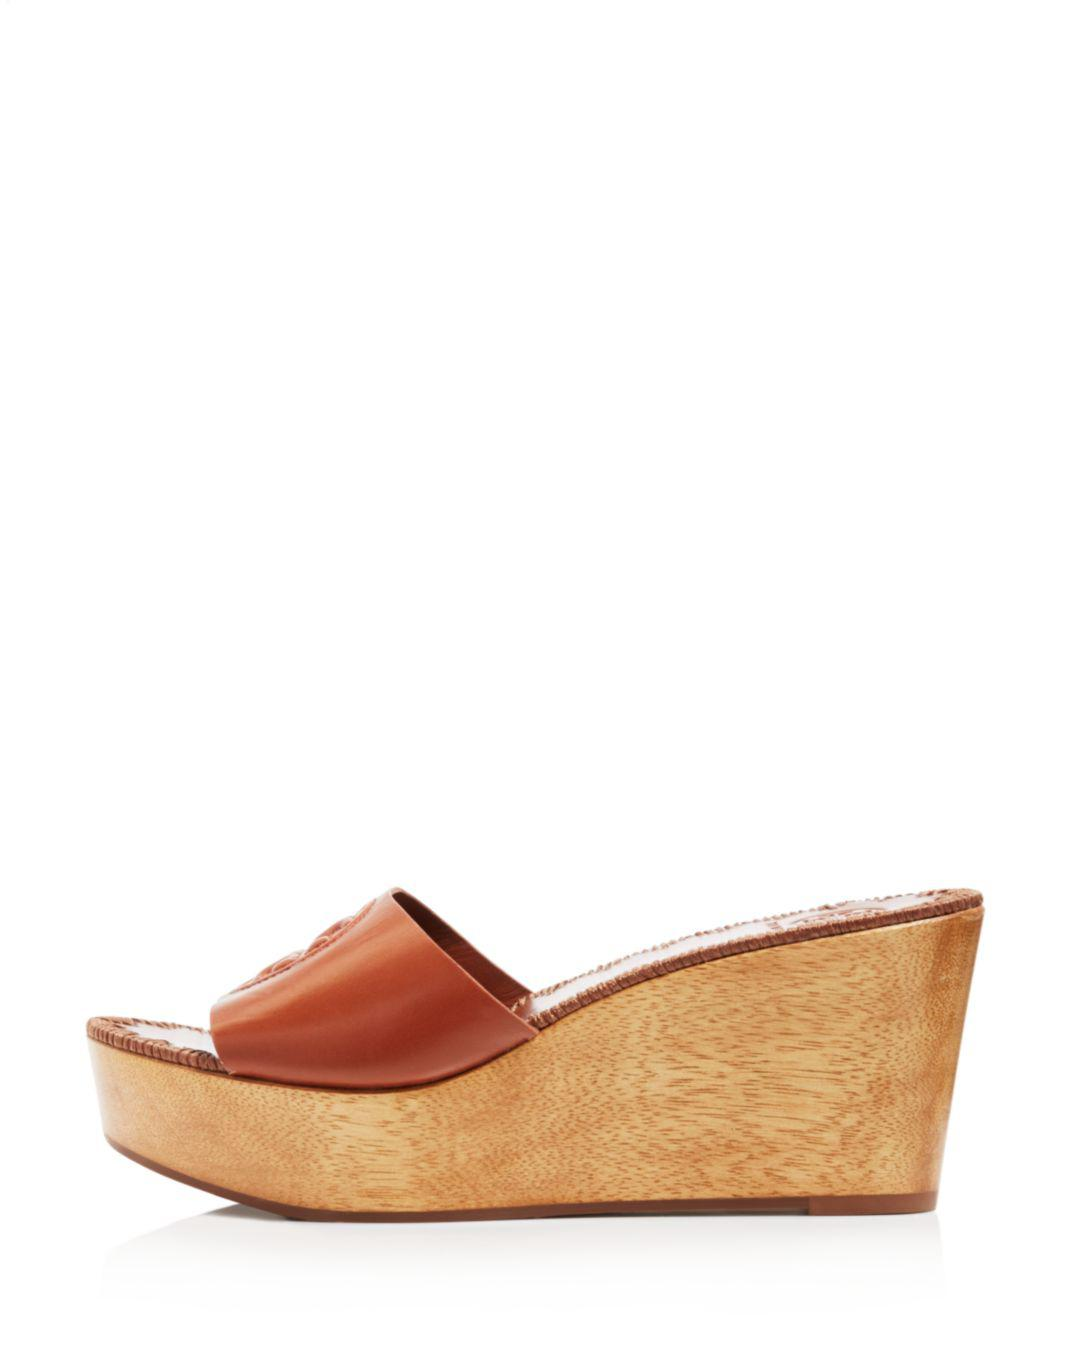 1f438630195ba Lyst - Tory Burch Women's Patty Leather Platform Wedge Slide Sandals